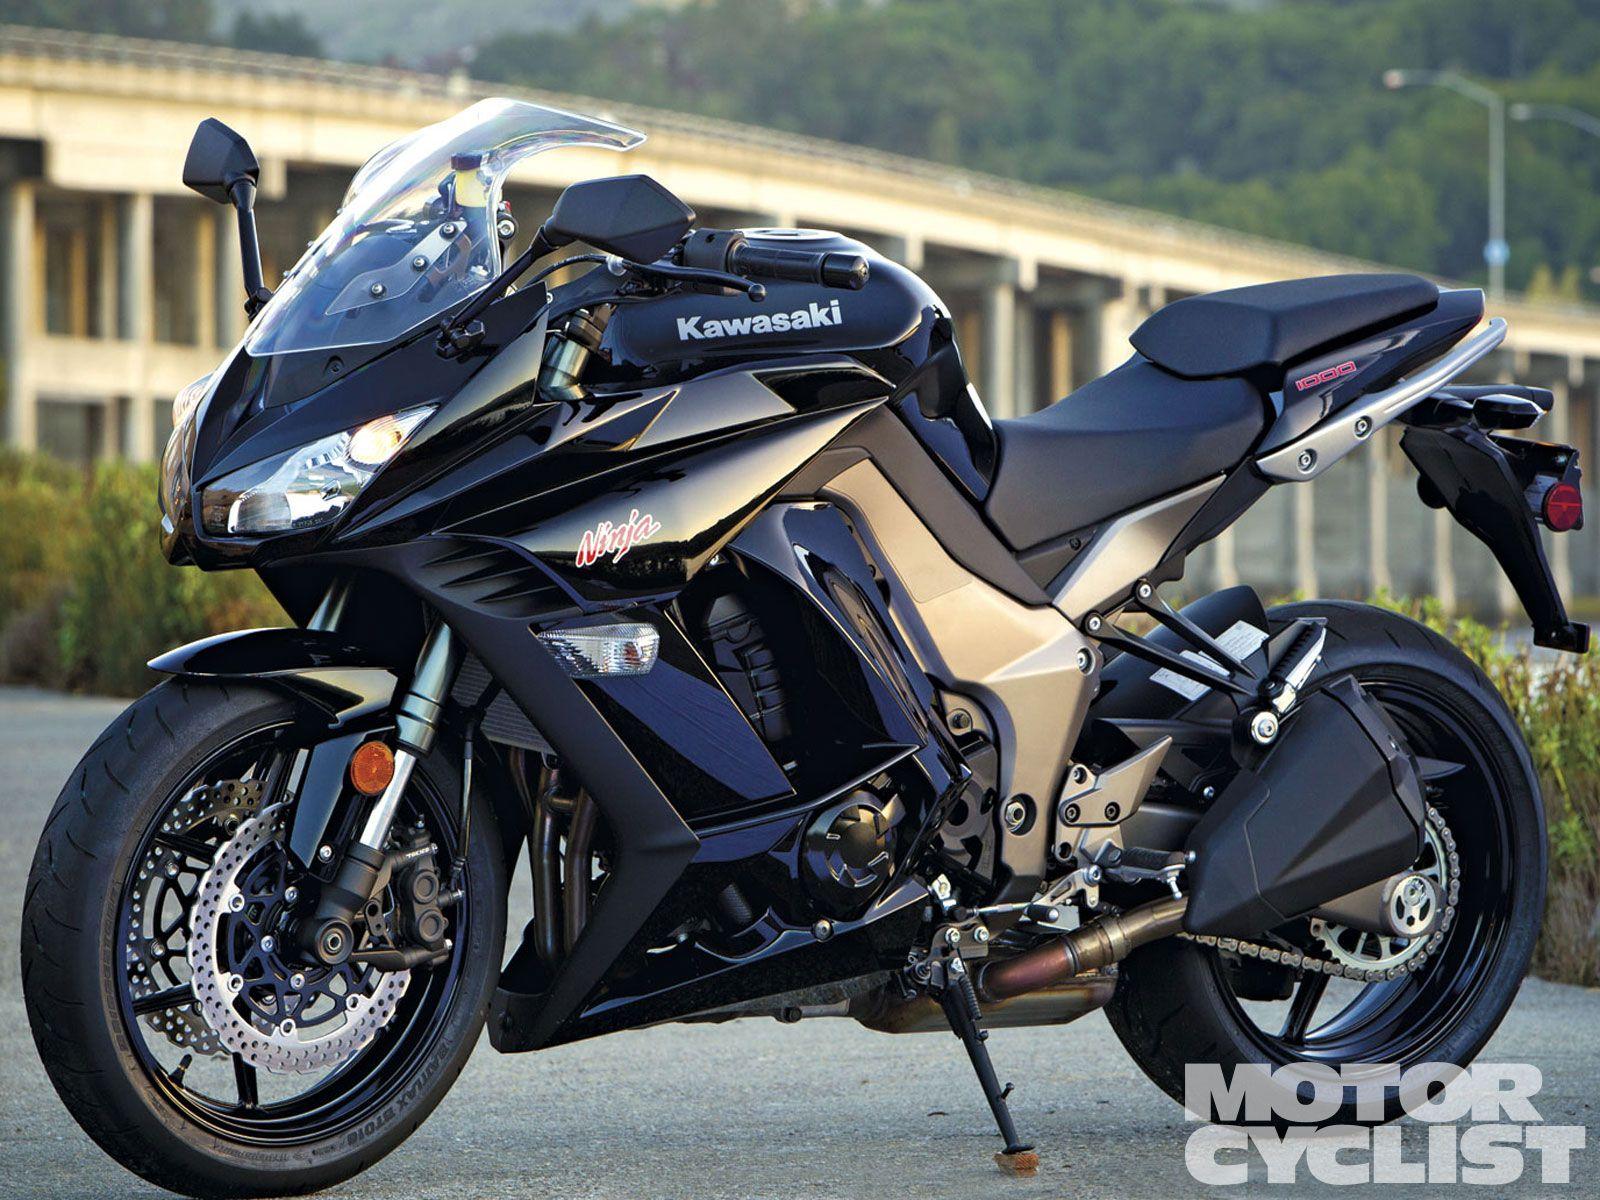 Kawasaki Ninja 1000 My Favorite Moto Bike Nate The Great On Front